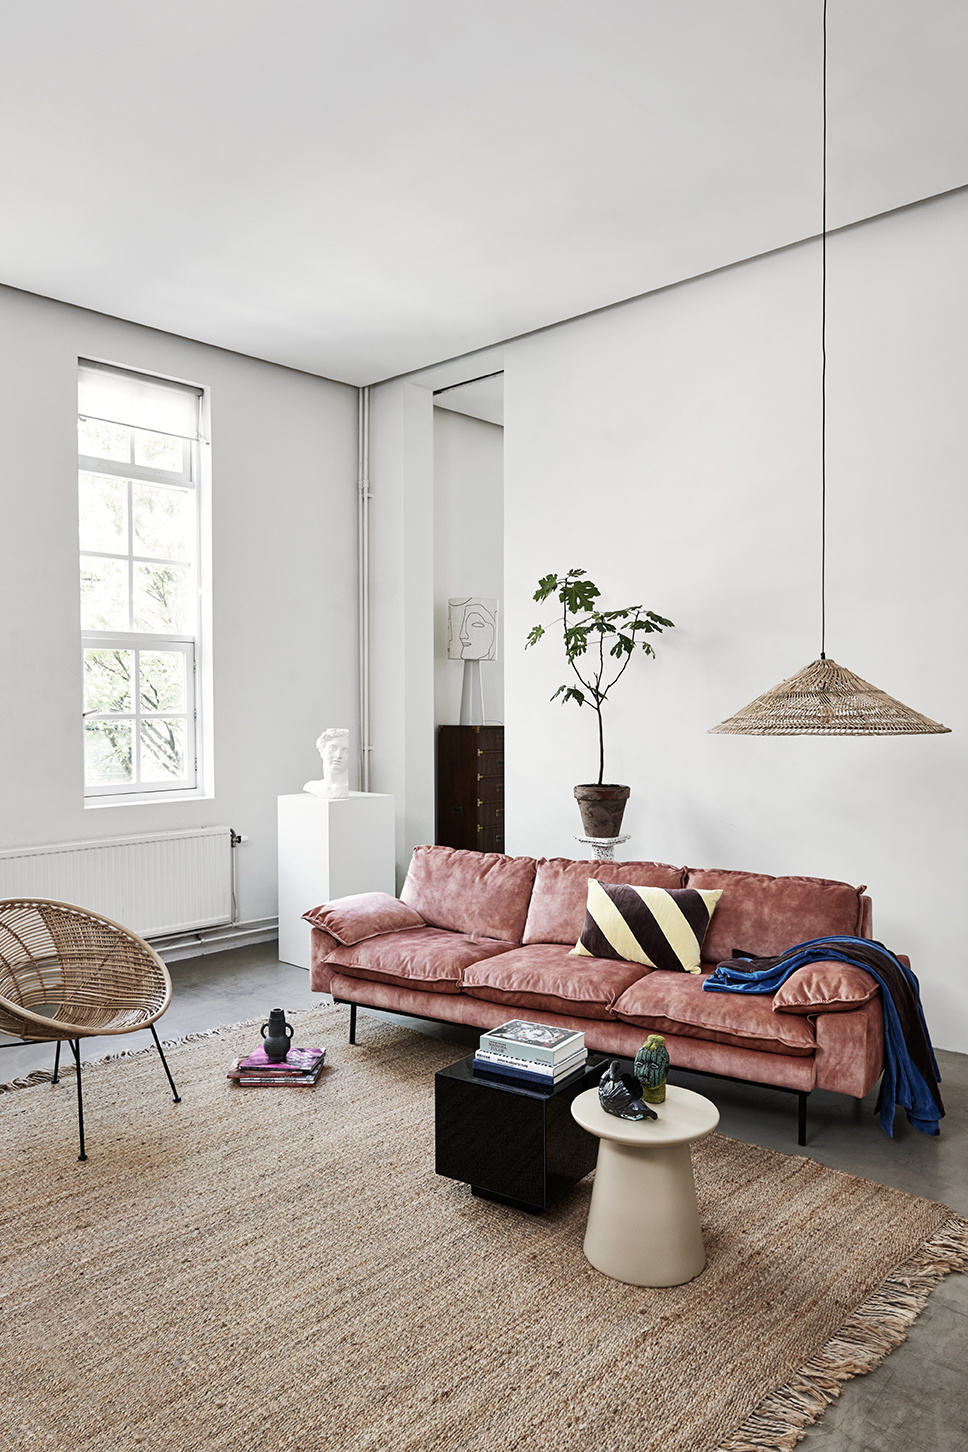 Sofa Hk Living Google Search Elegant Bedroom Decor Retro Sofa Log Home Interiors [ 1452 x 968 Pixel ]